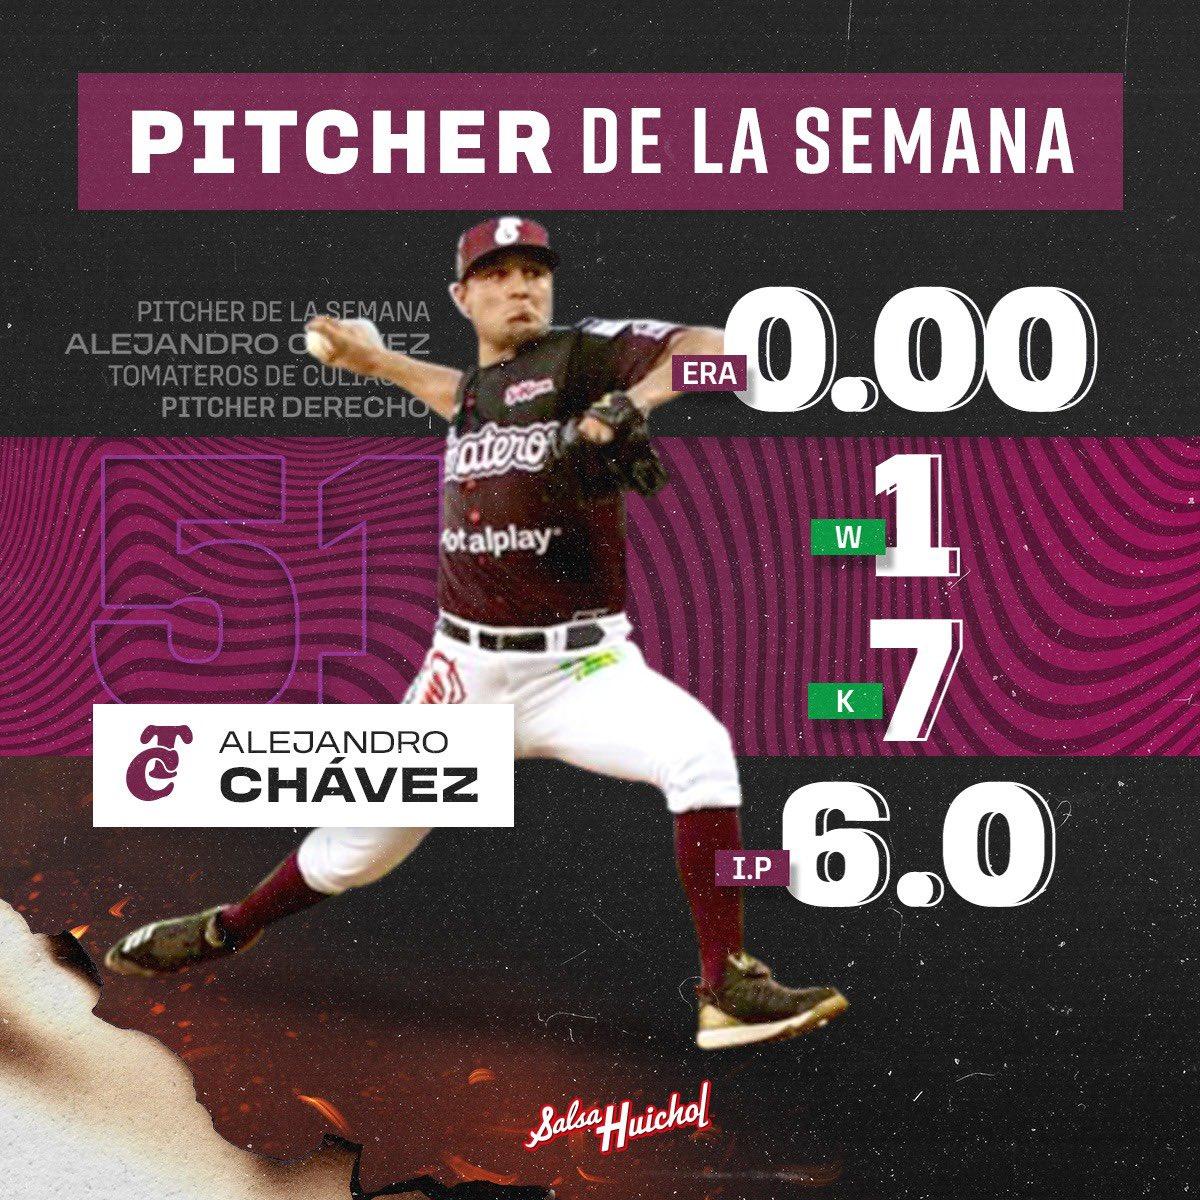 Alejandro Chávez pitcher de la semana